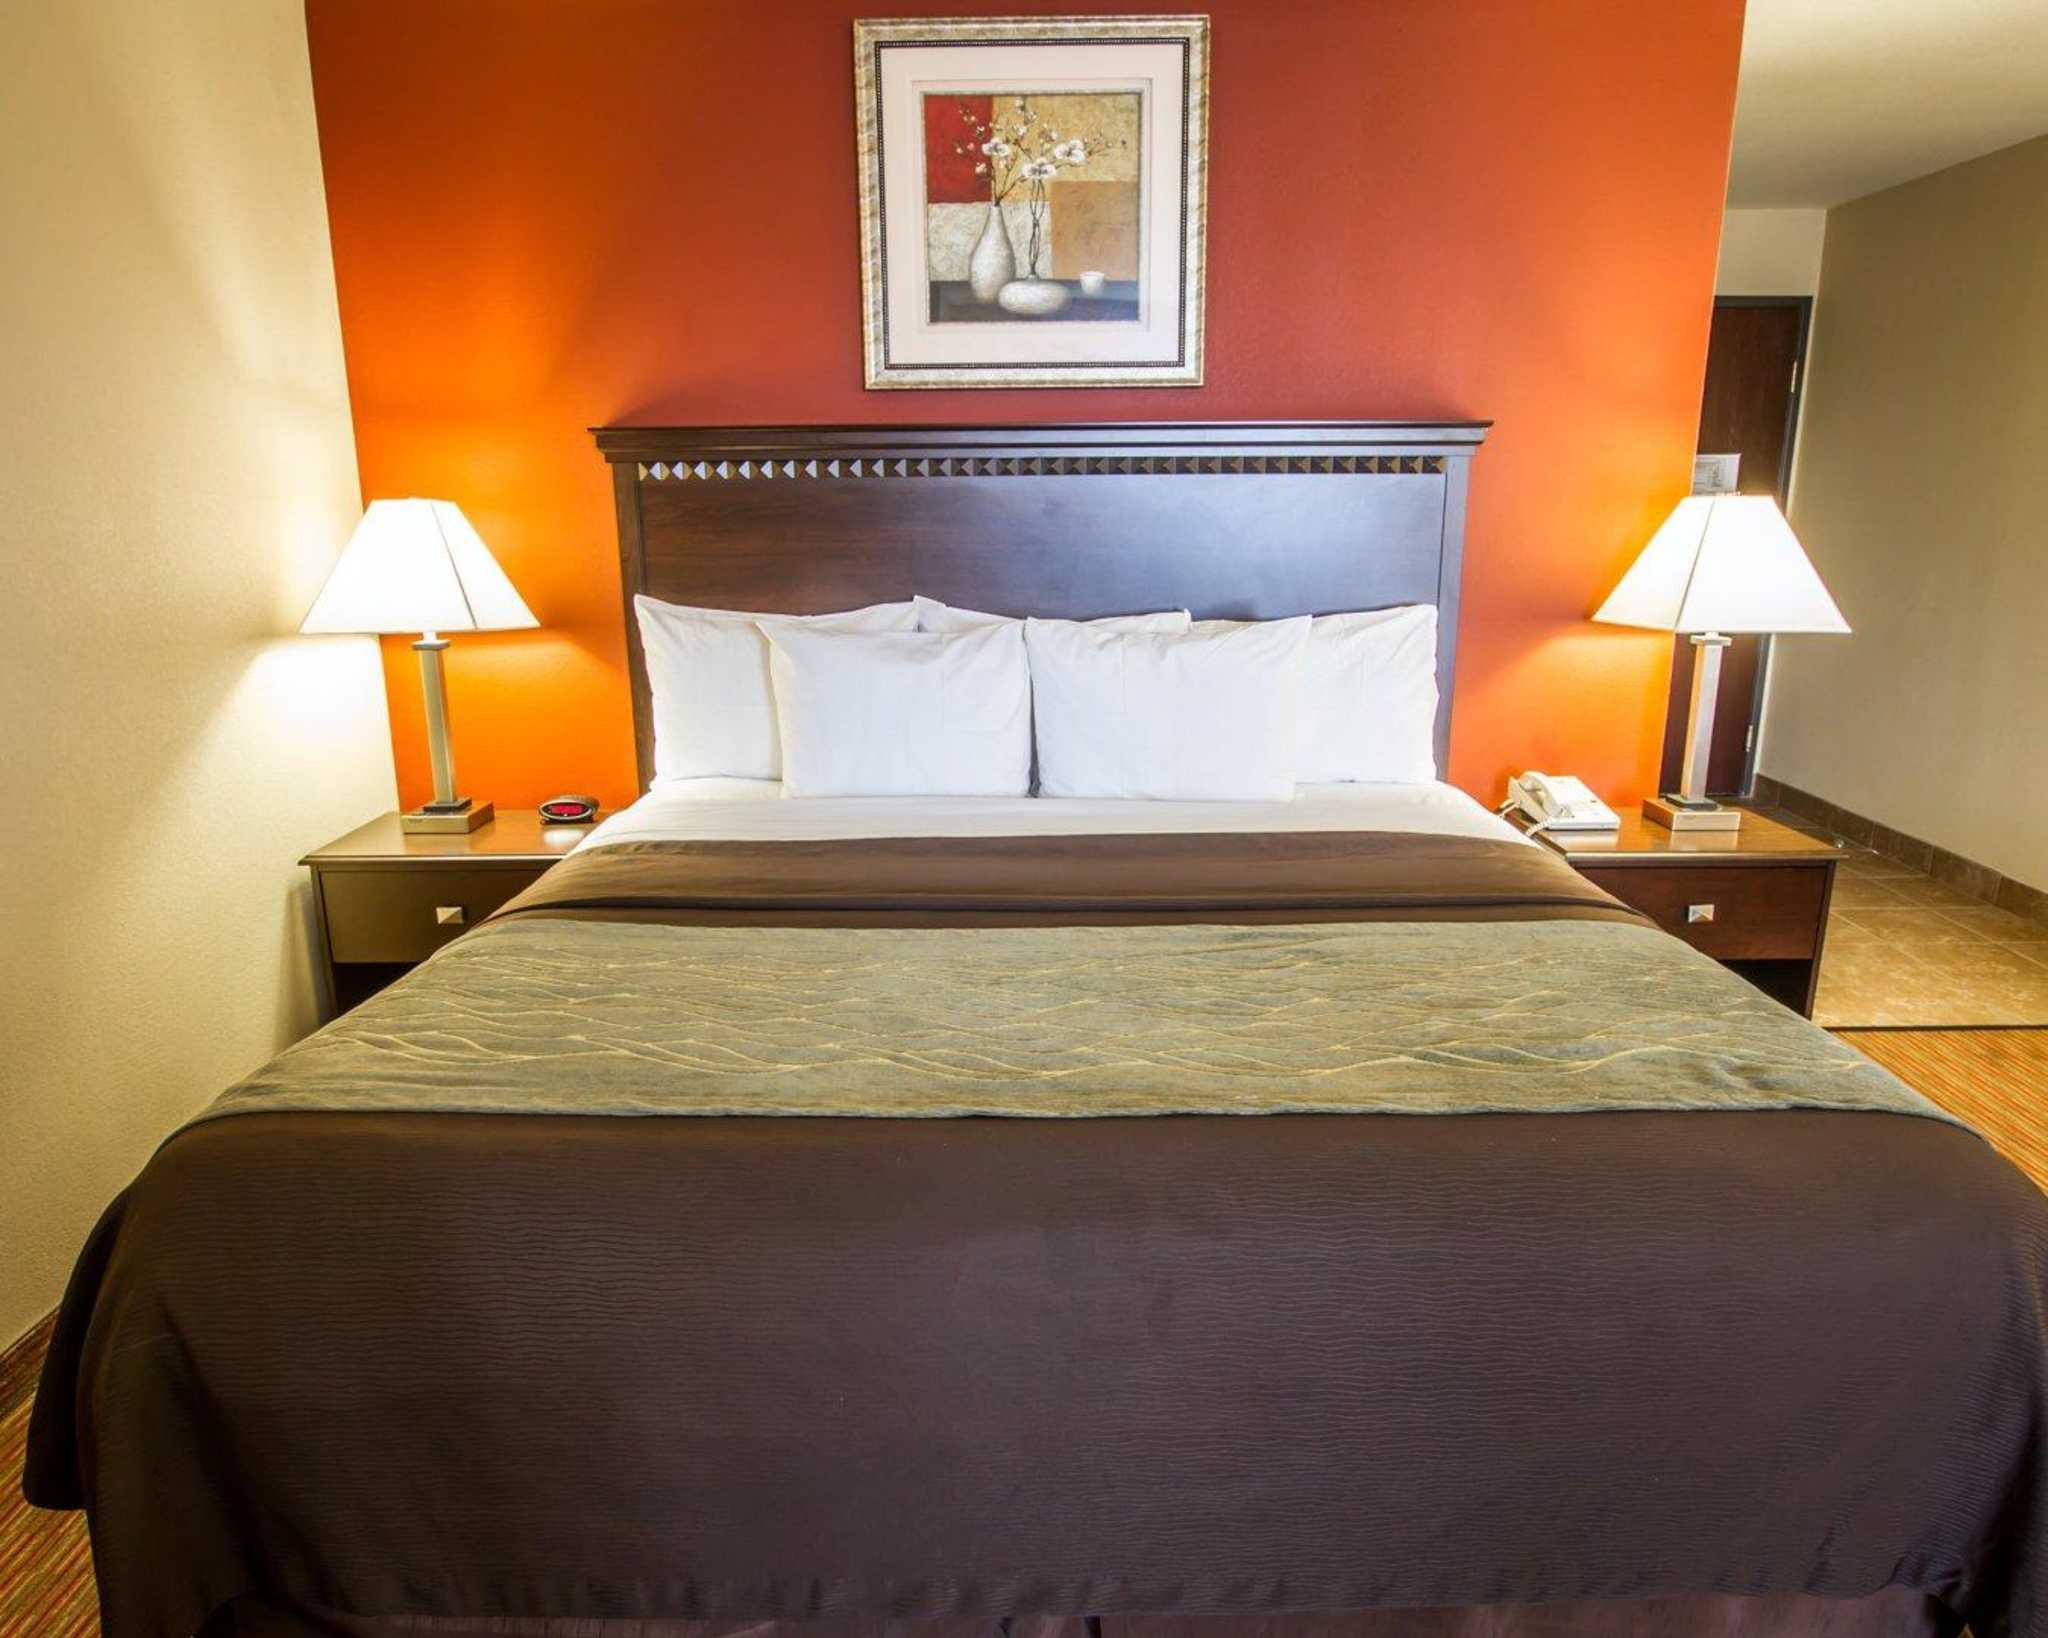 Comfort Inn West image 8